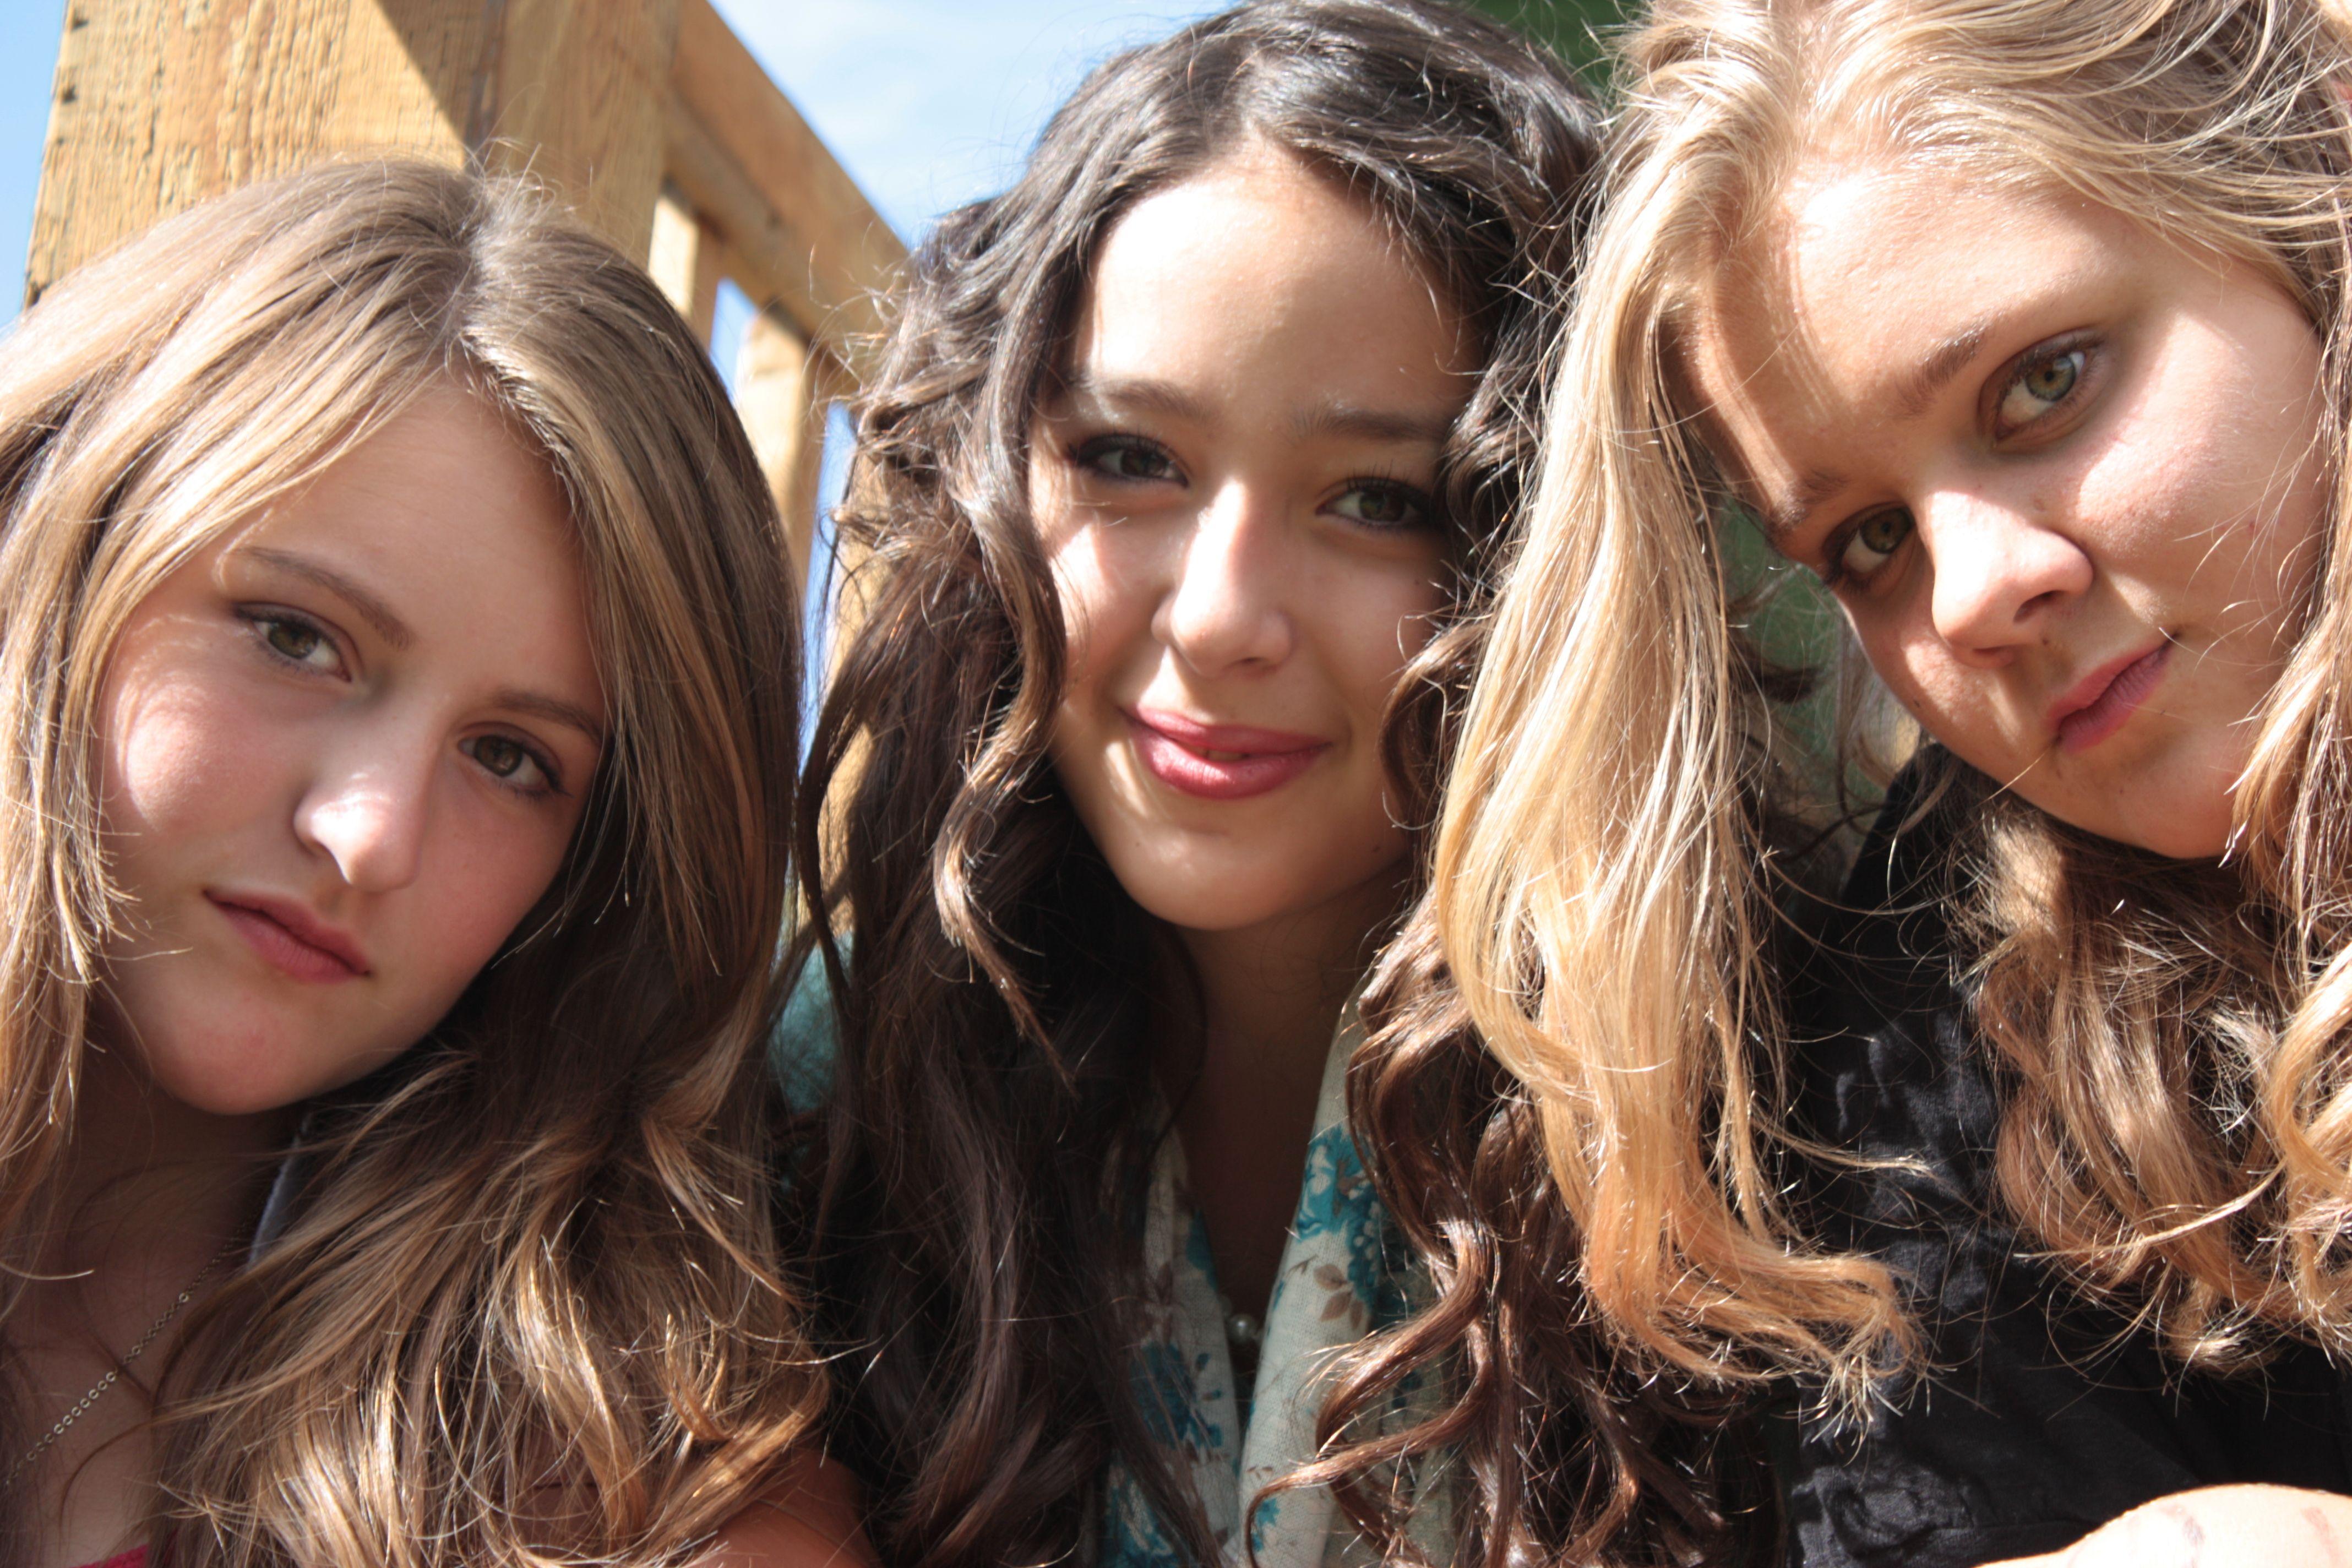 Friends 4 life